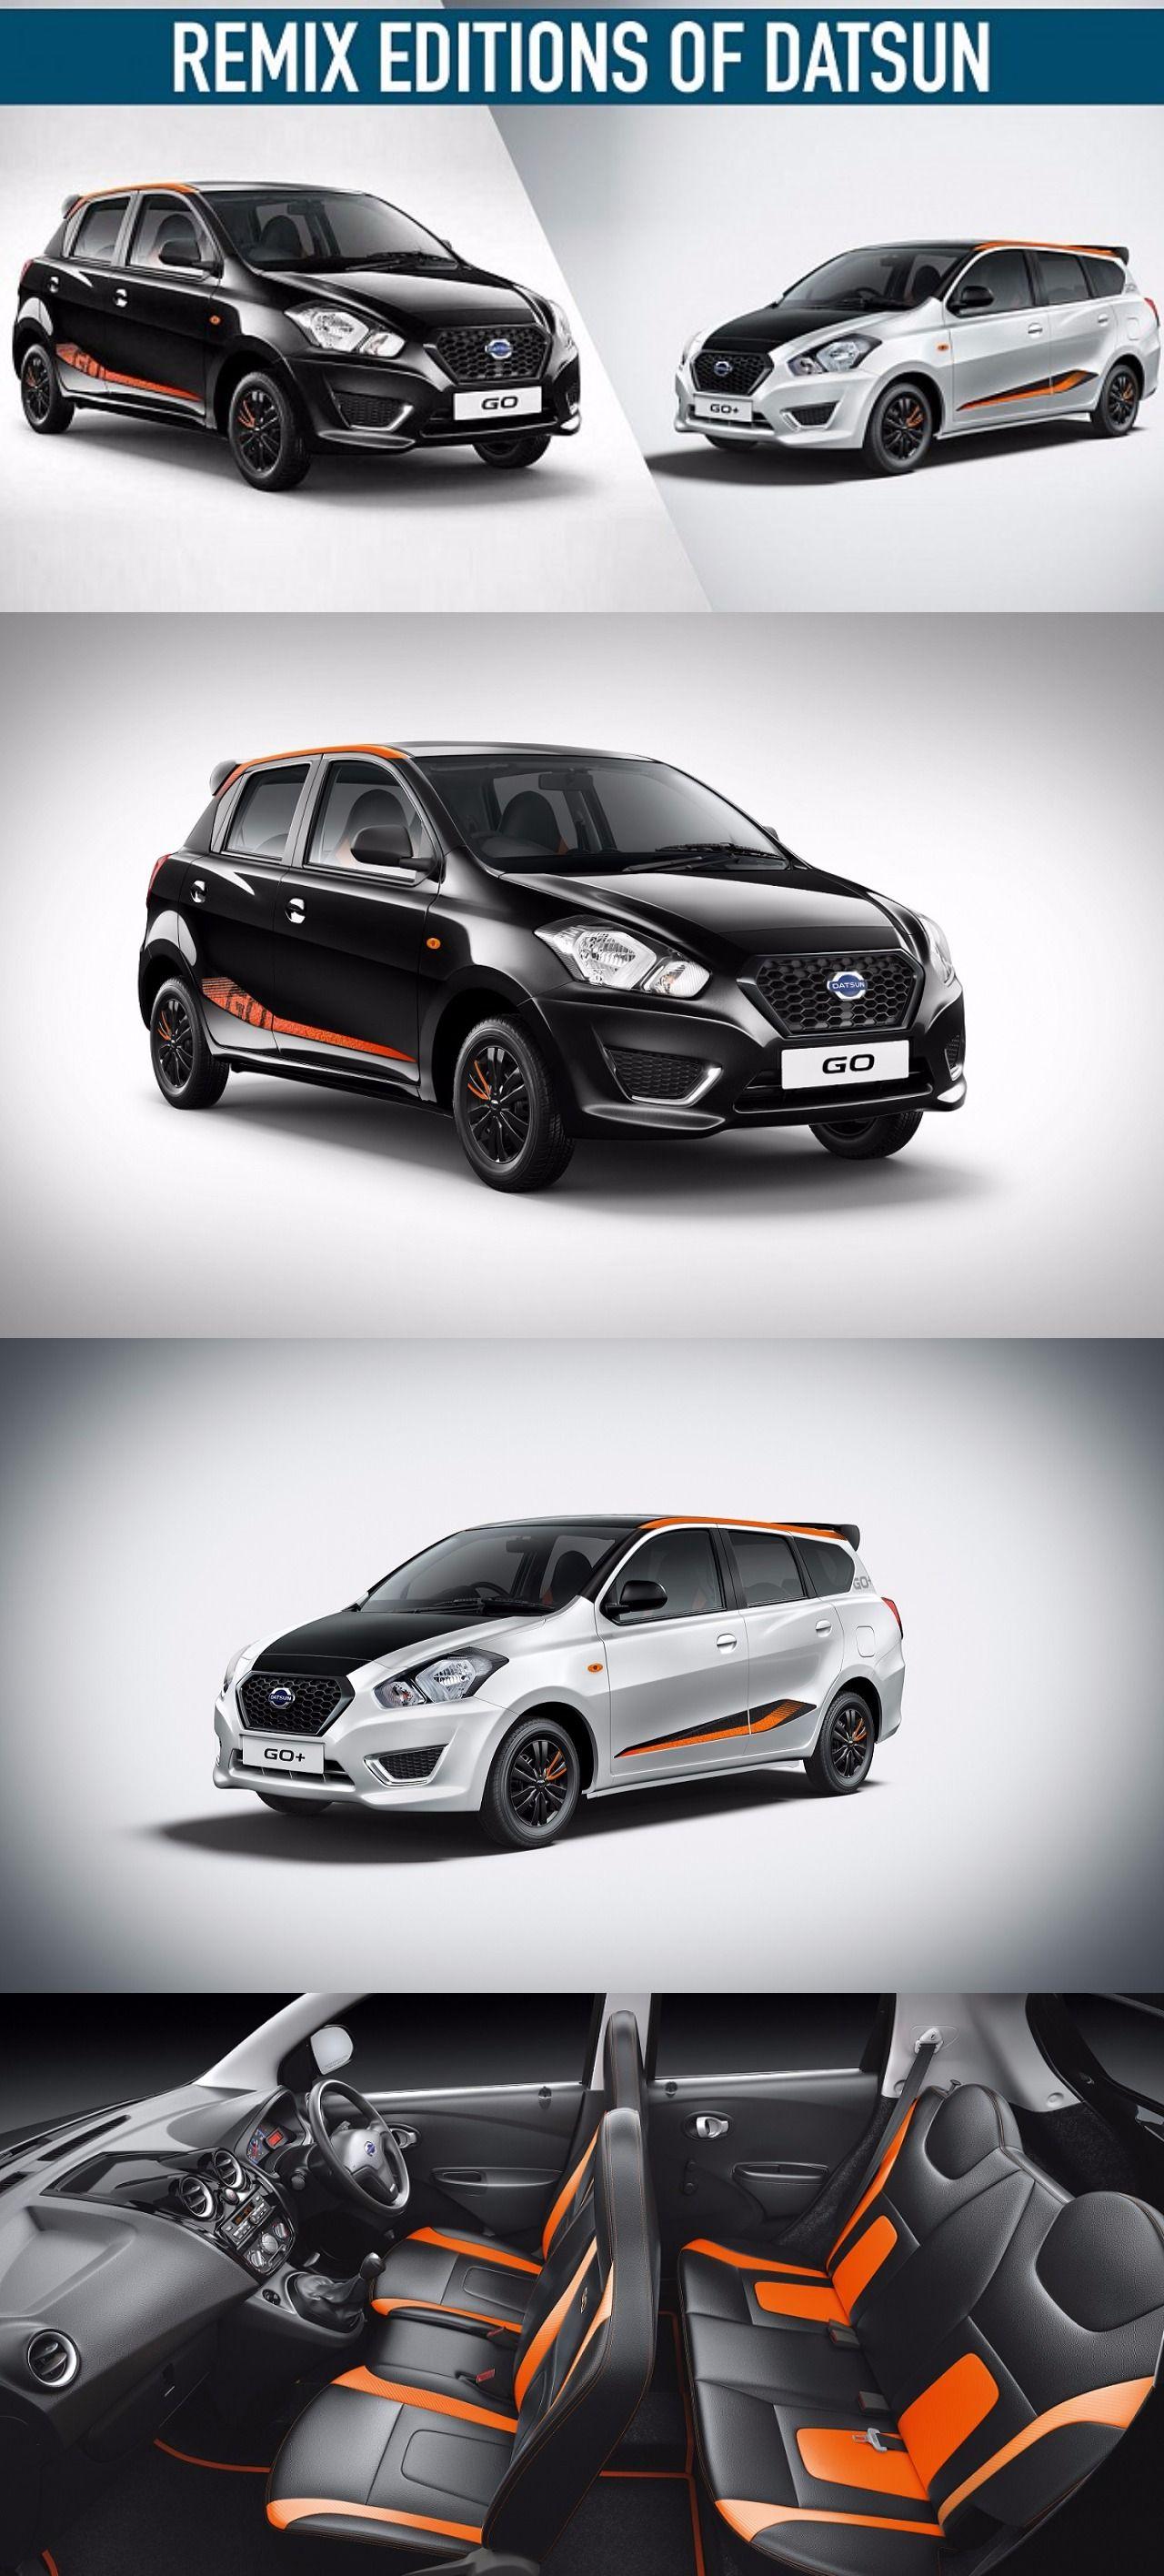 27 Datsun Ideas Datsun Automobile Product Launch